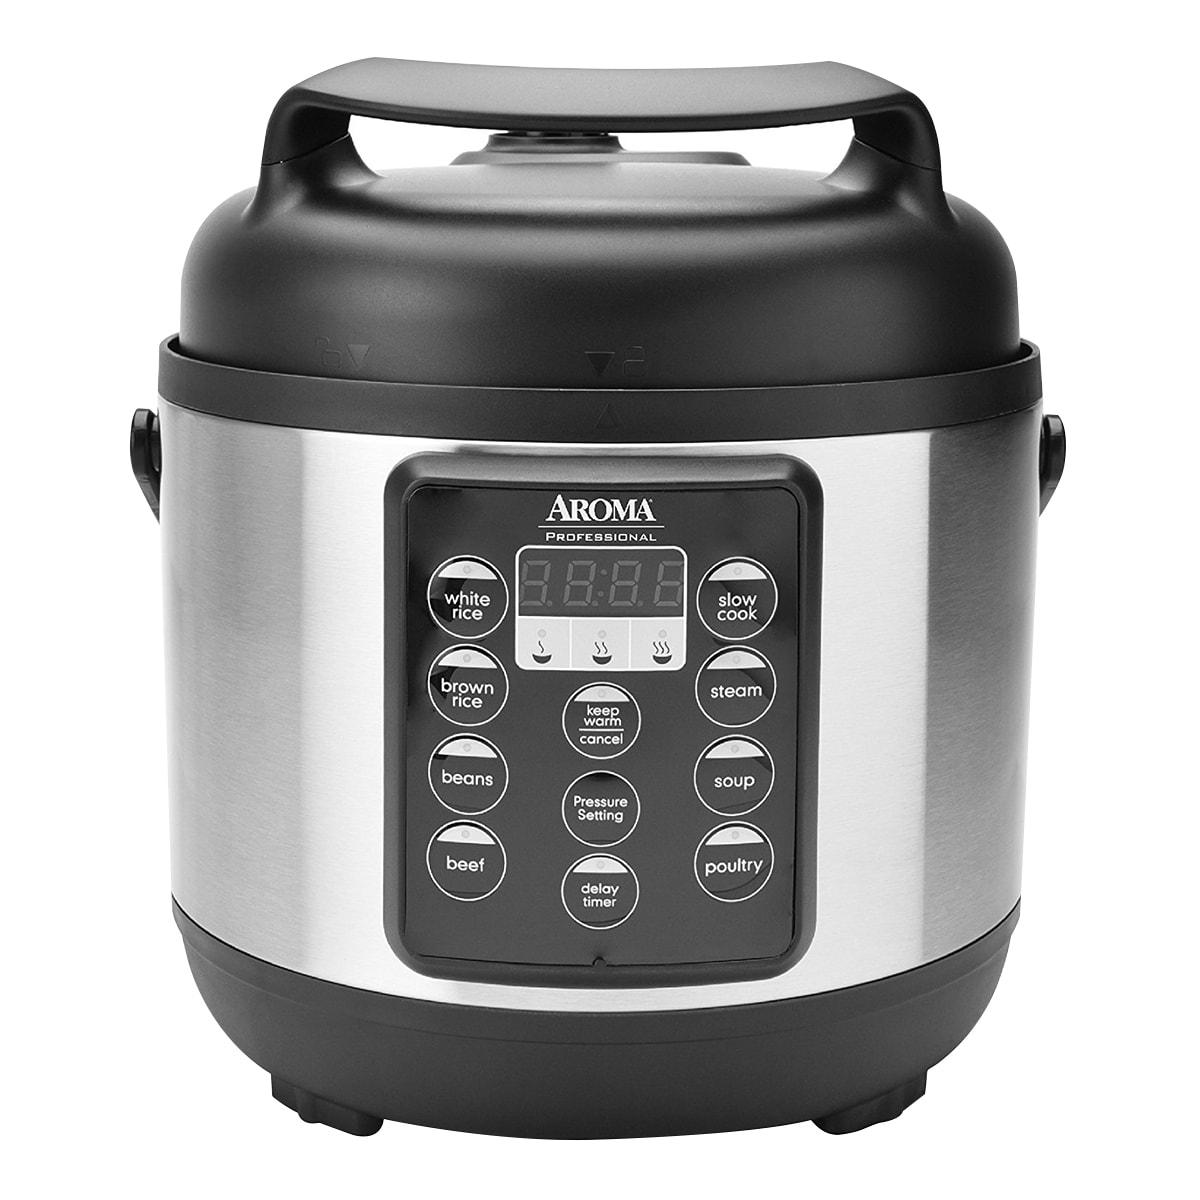 Aroma Housewares Digital Professional Pressure Cooker 3QT APC-816SB